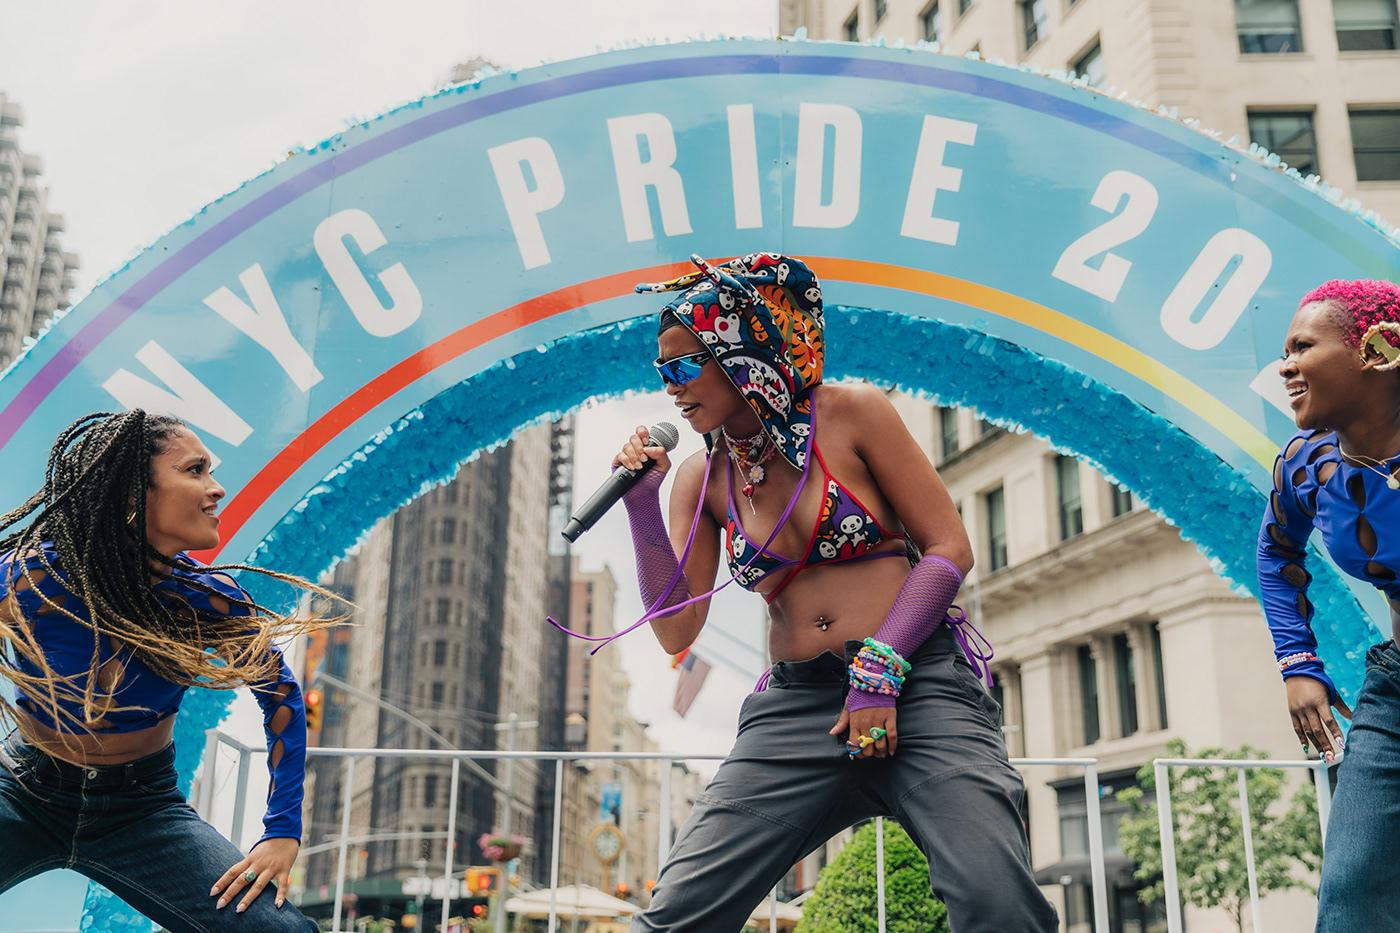 action concert concert photography New York new york pride nyc pride  portrait photography pride pride month princess nokia